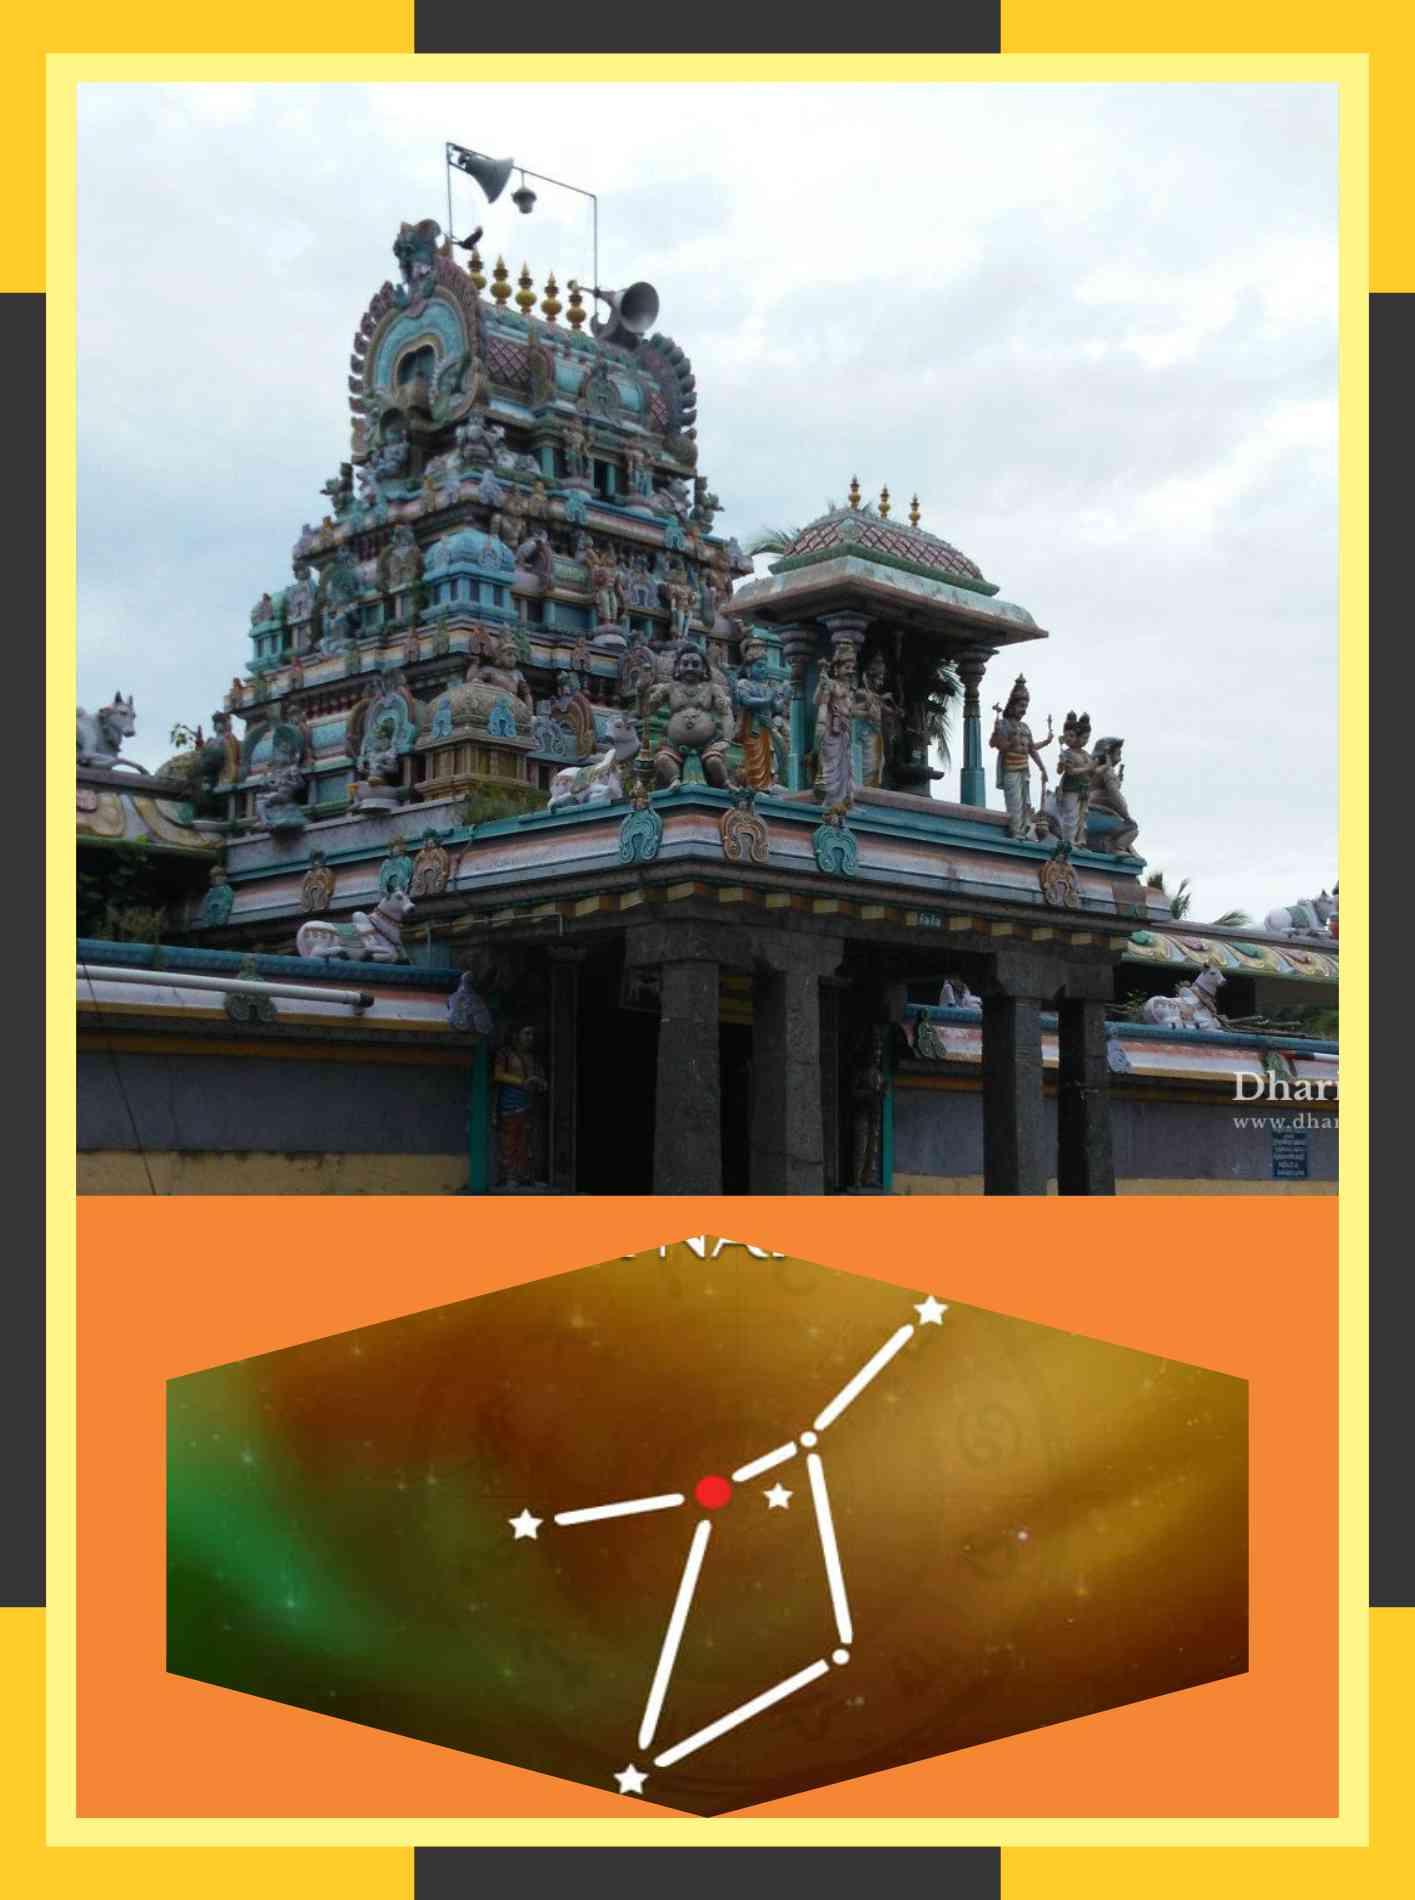 Arasili - Arasaleeswarar Temple Spl Parihara Puja for Poosam Star